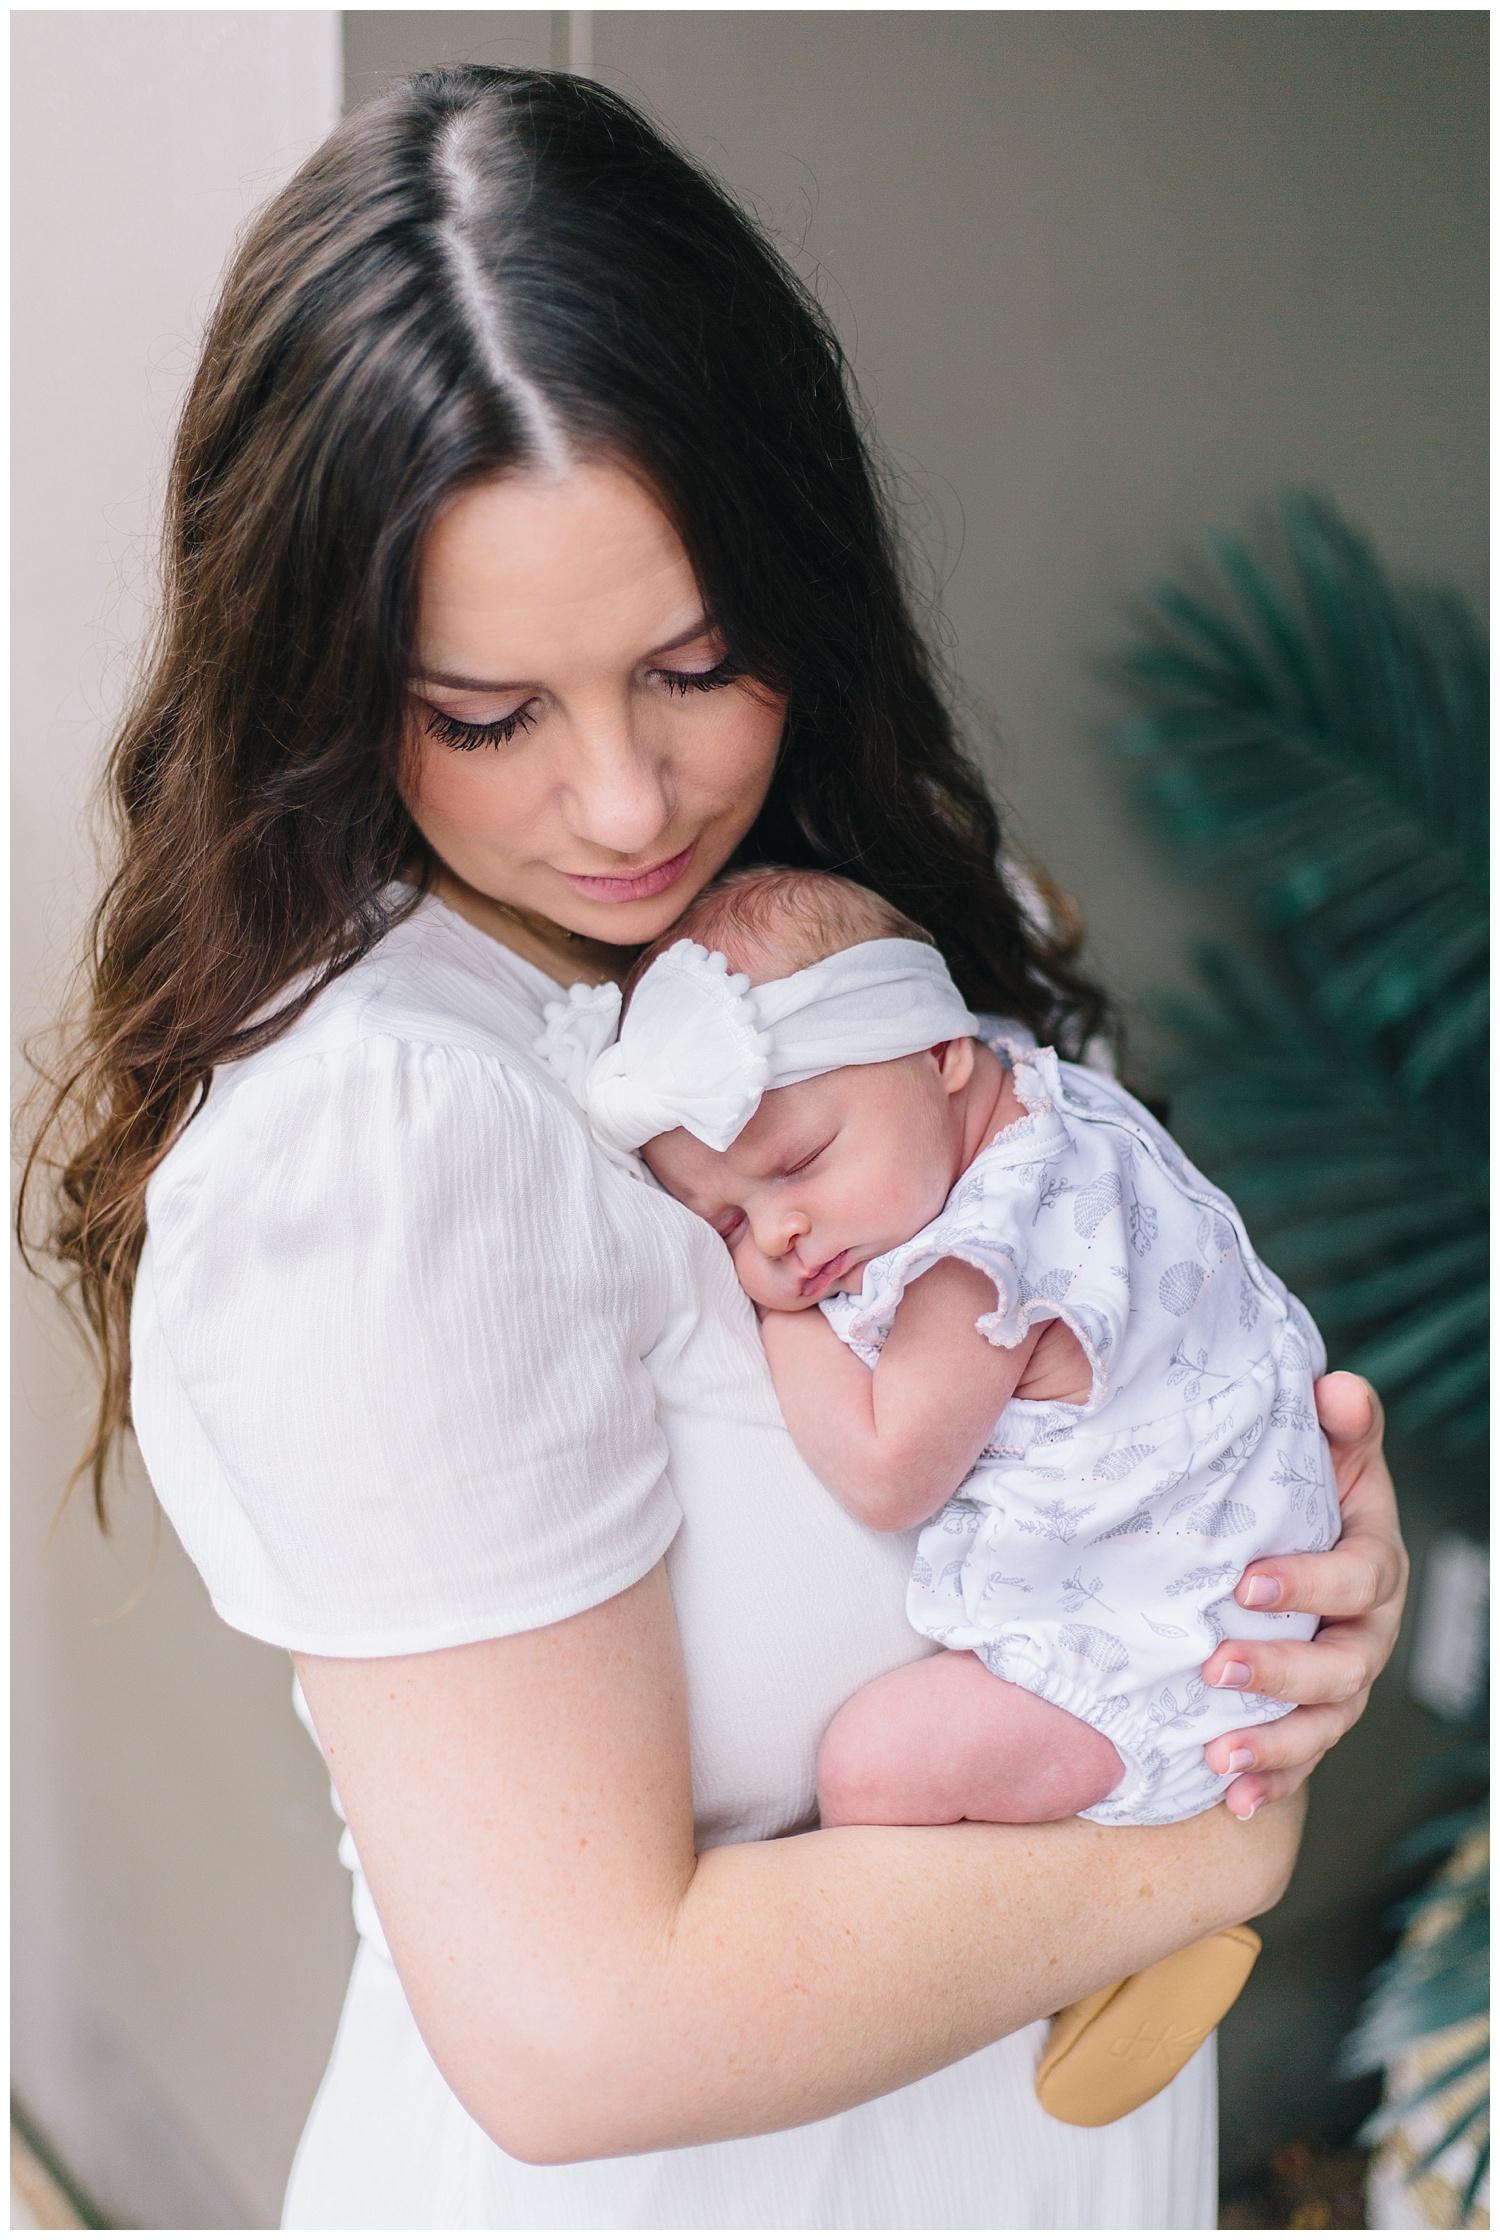 newborn-baby-emily-belson-photography-dc-08.jpg